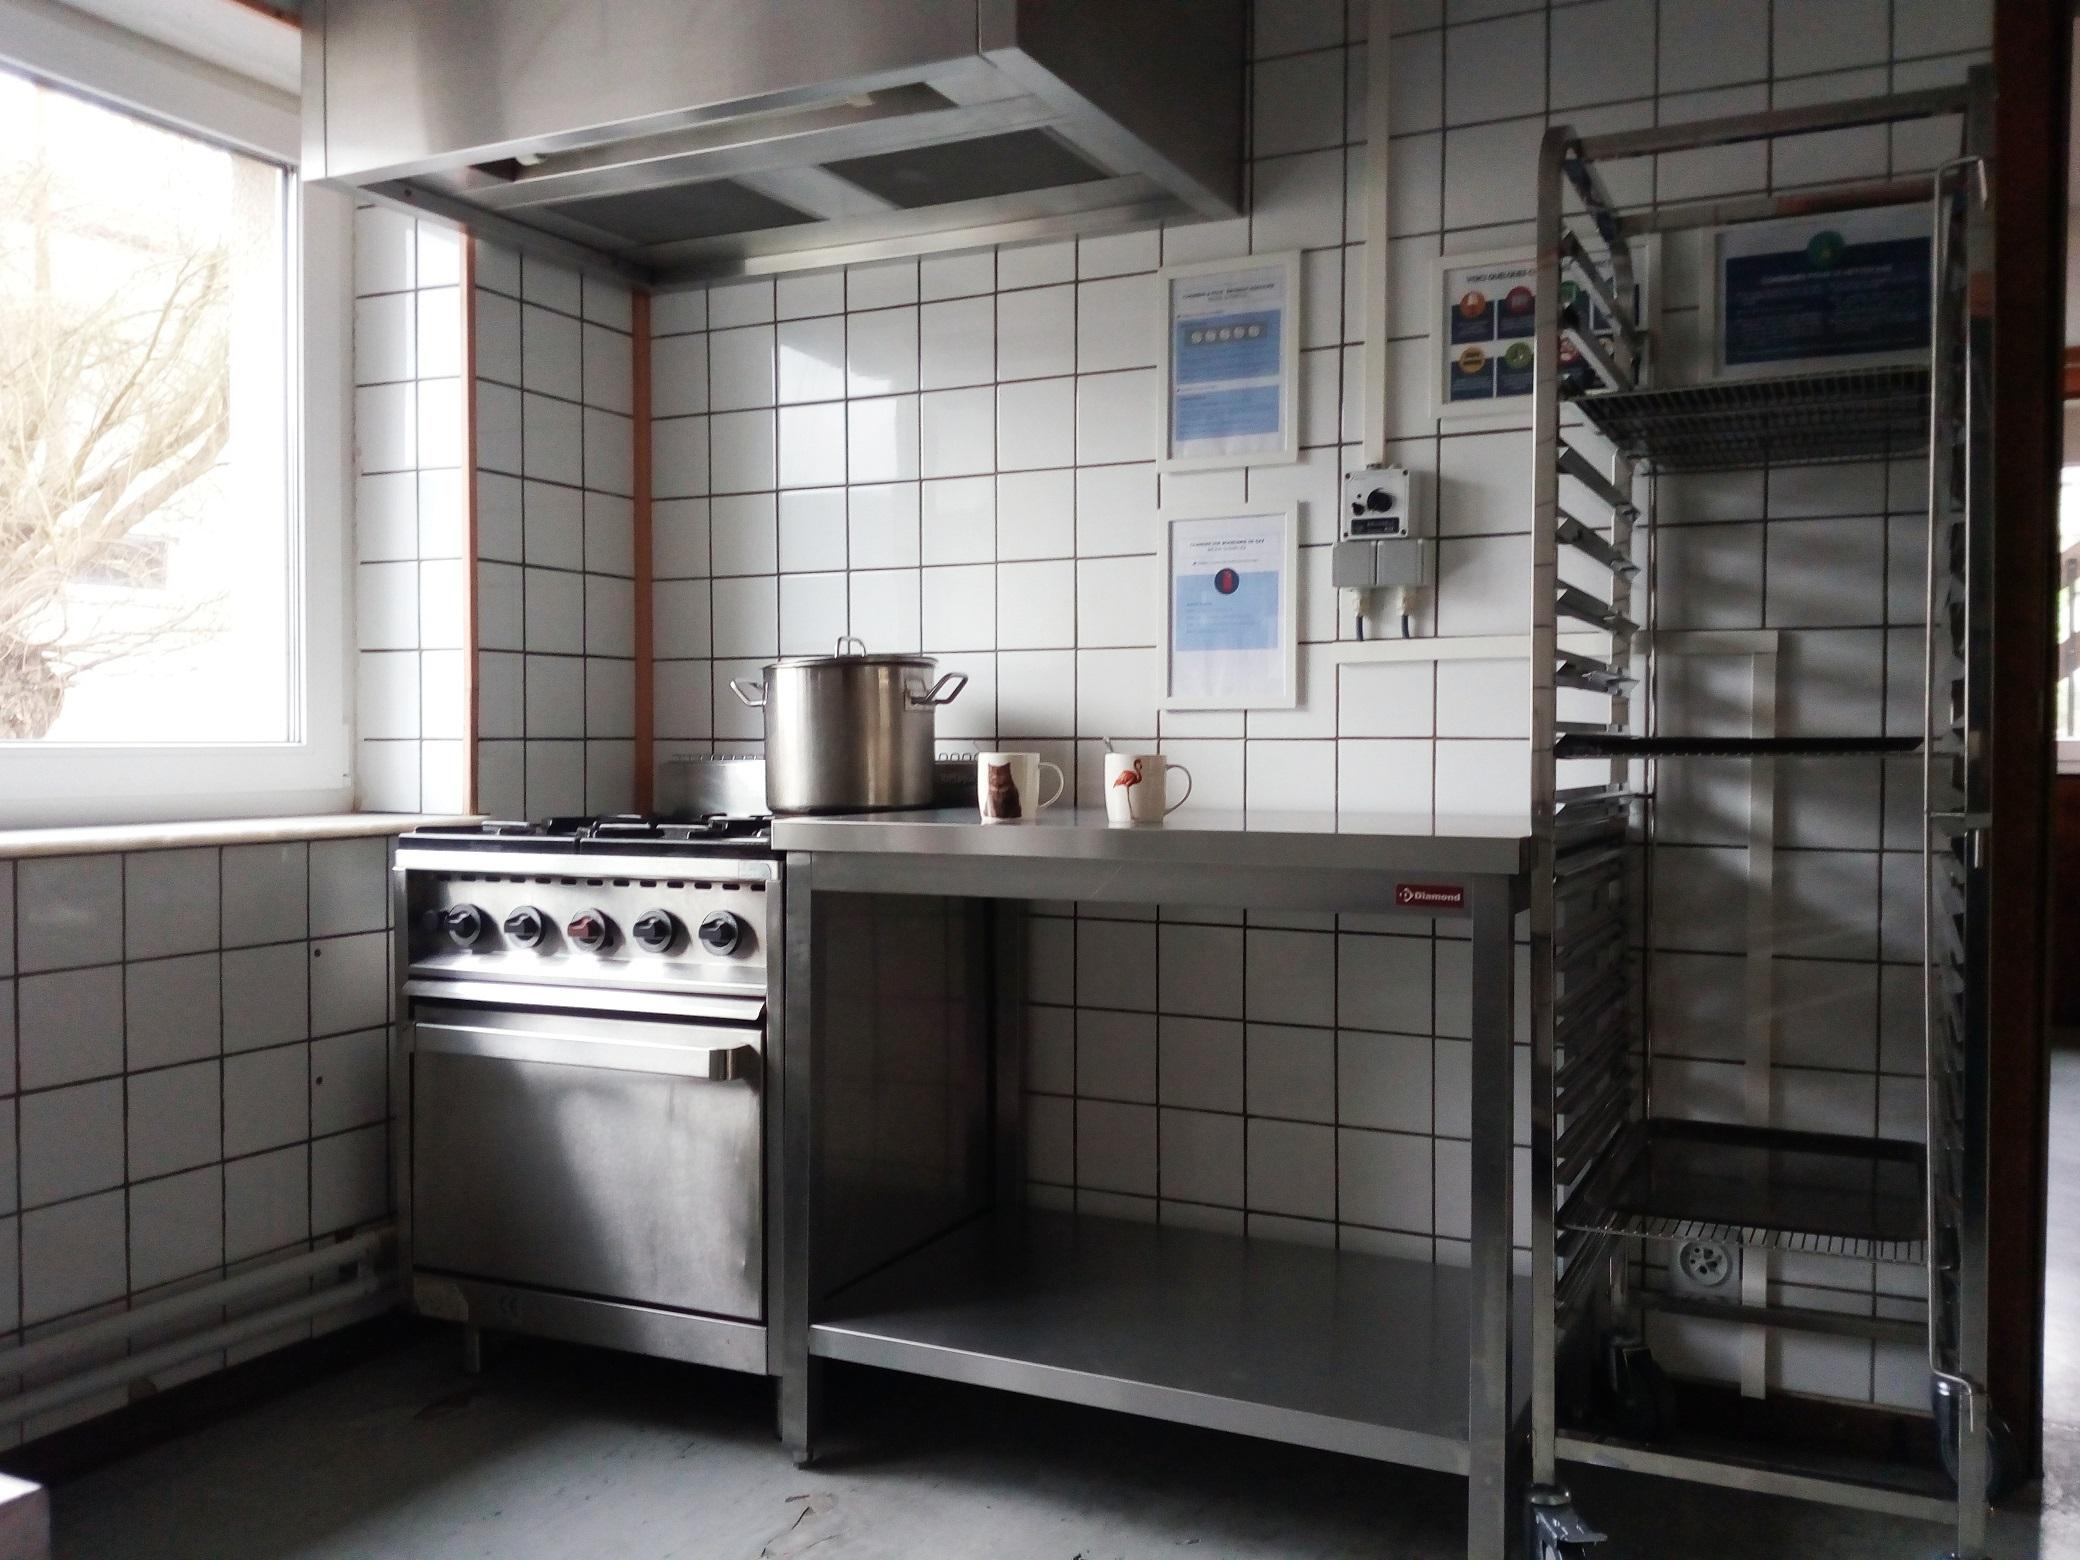 Cuisine équipée - Bât. Adenauer